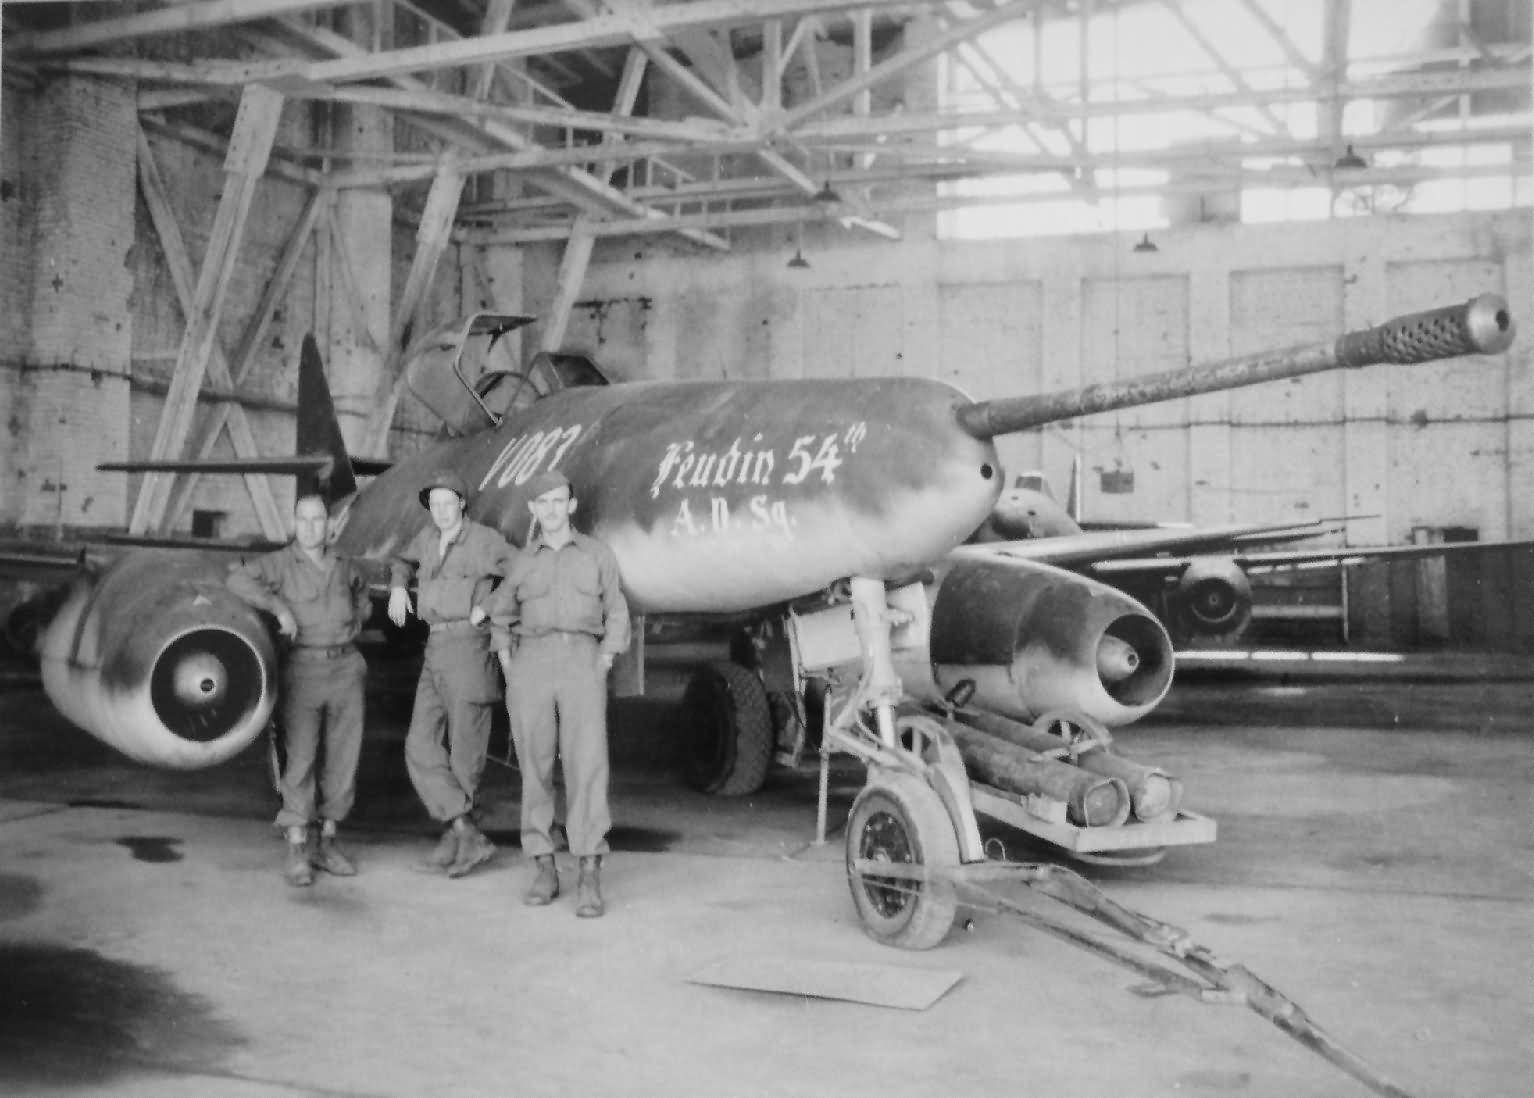 Me262 V083 with a 50mm Rheinmetall Mauser BK 5 cannon